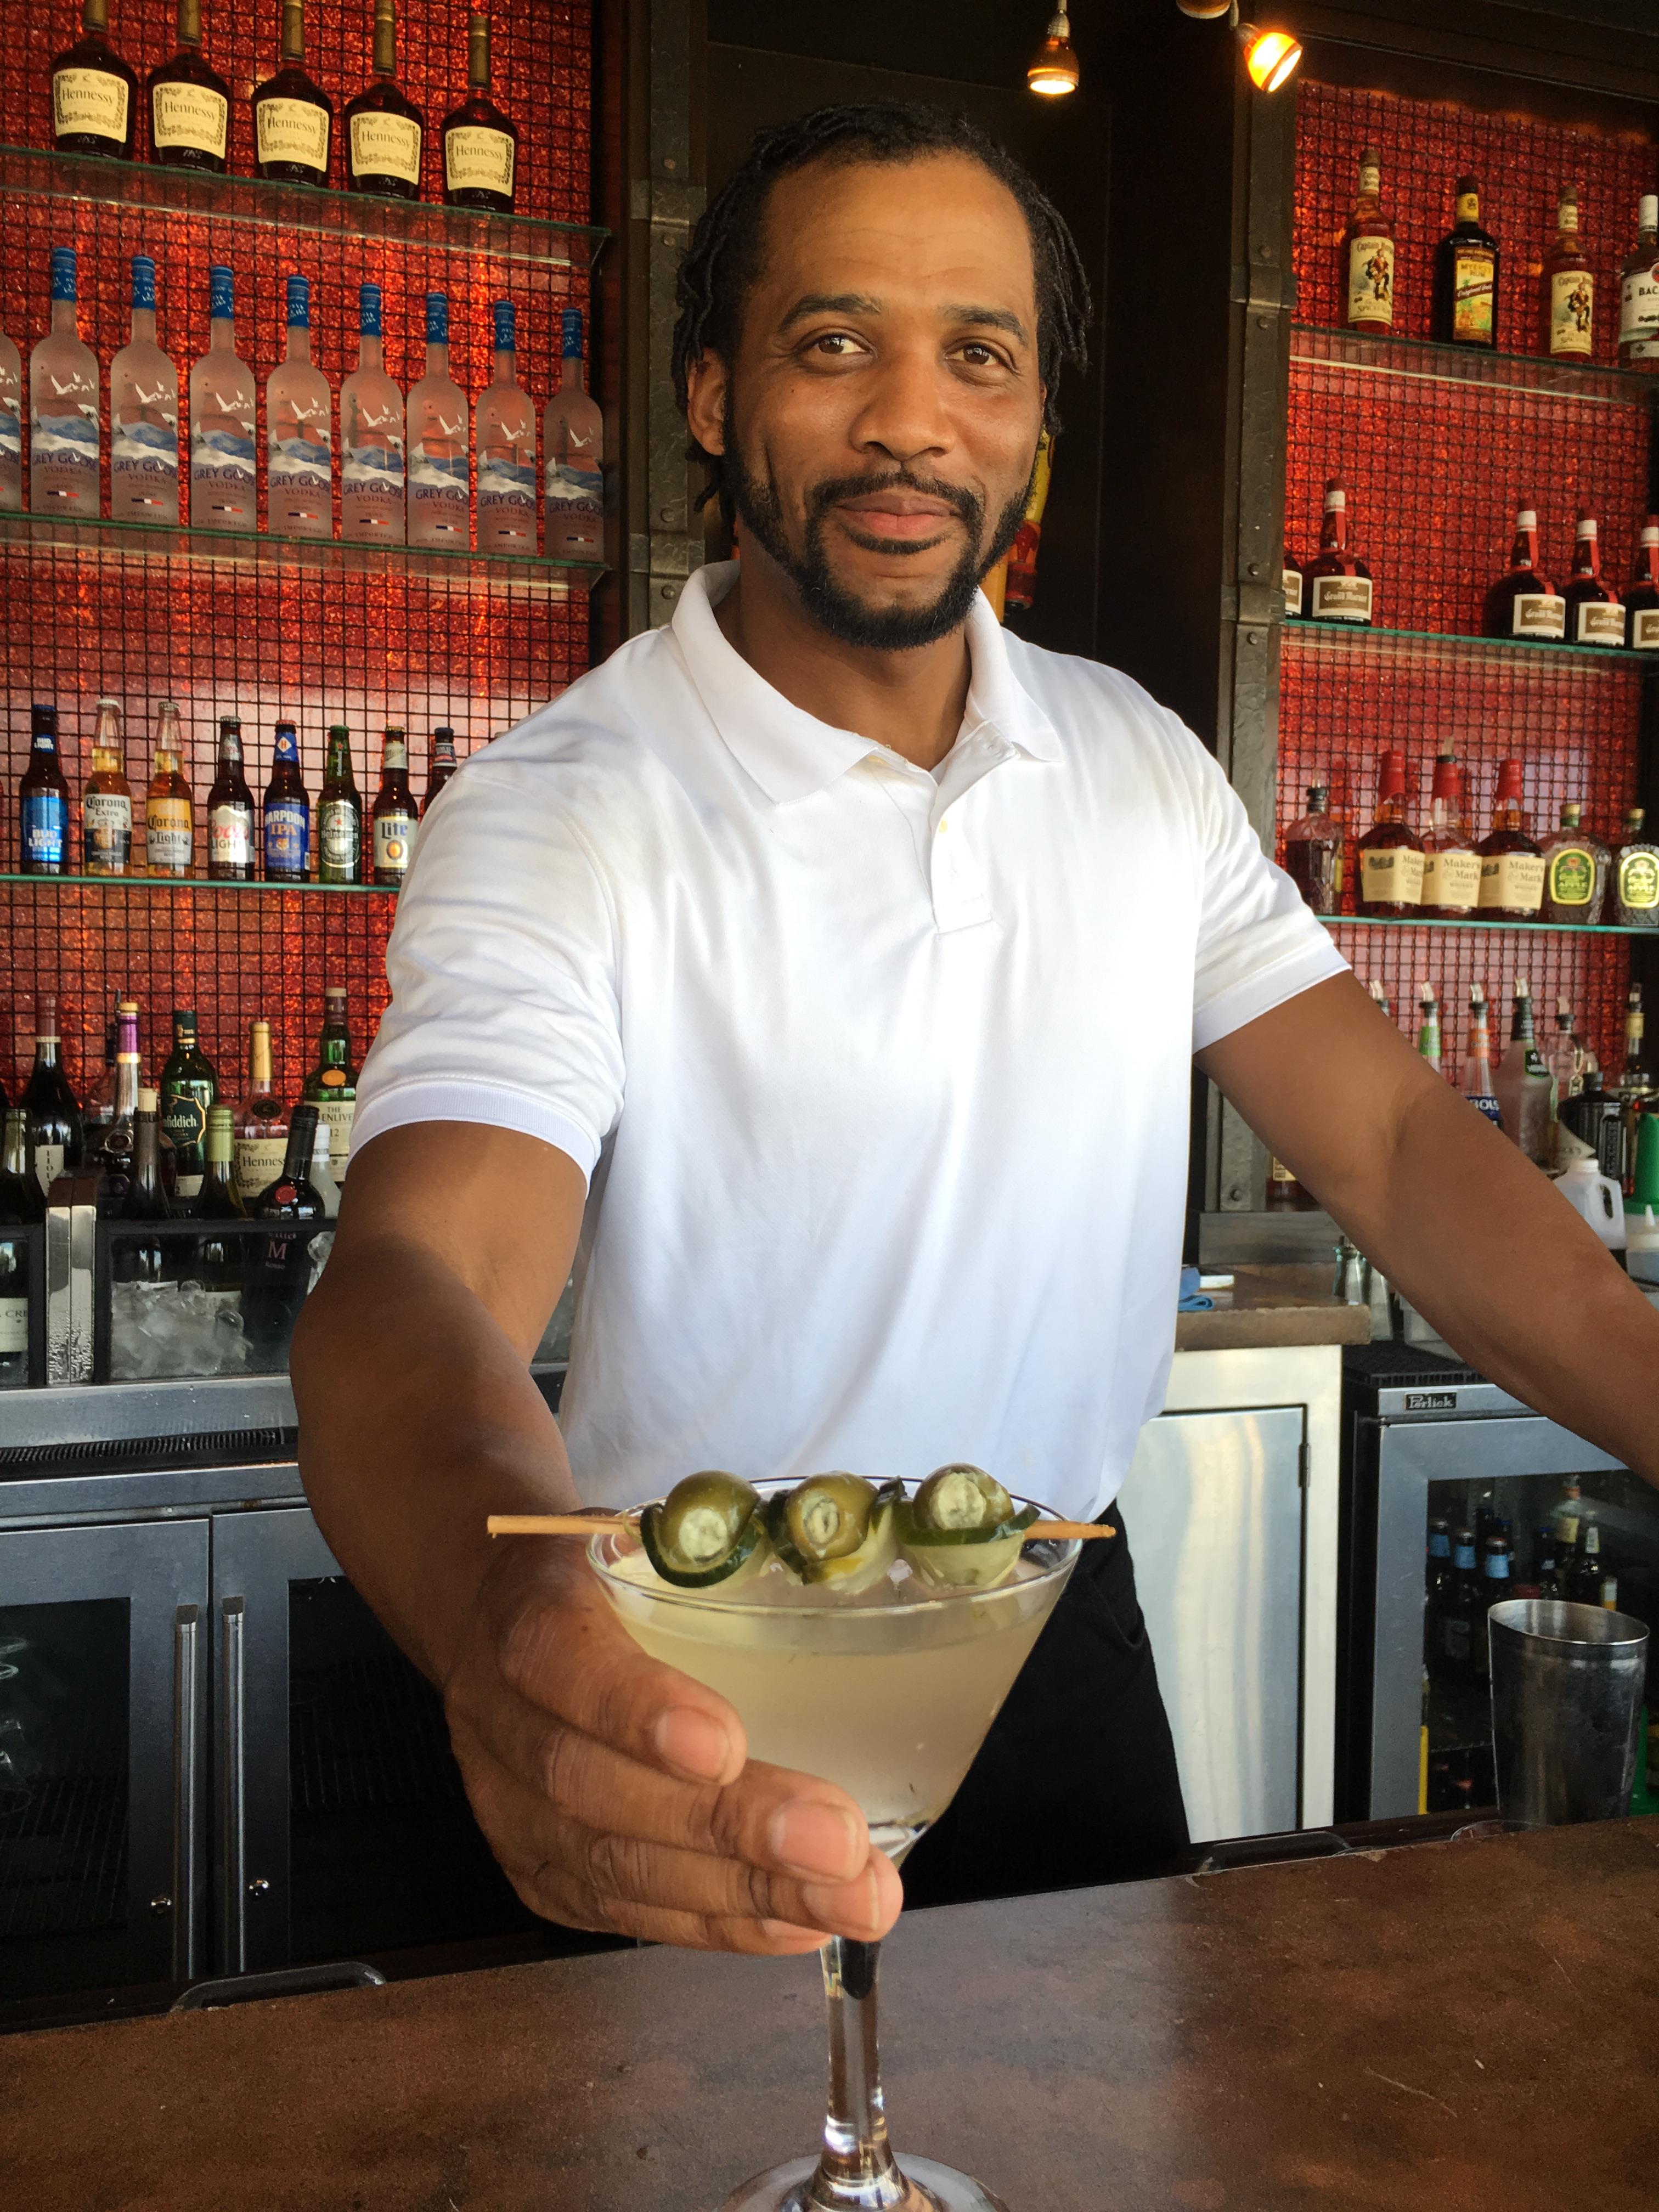 Behind the Bar: Neil L. Burroughs